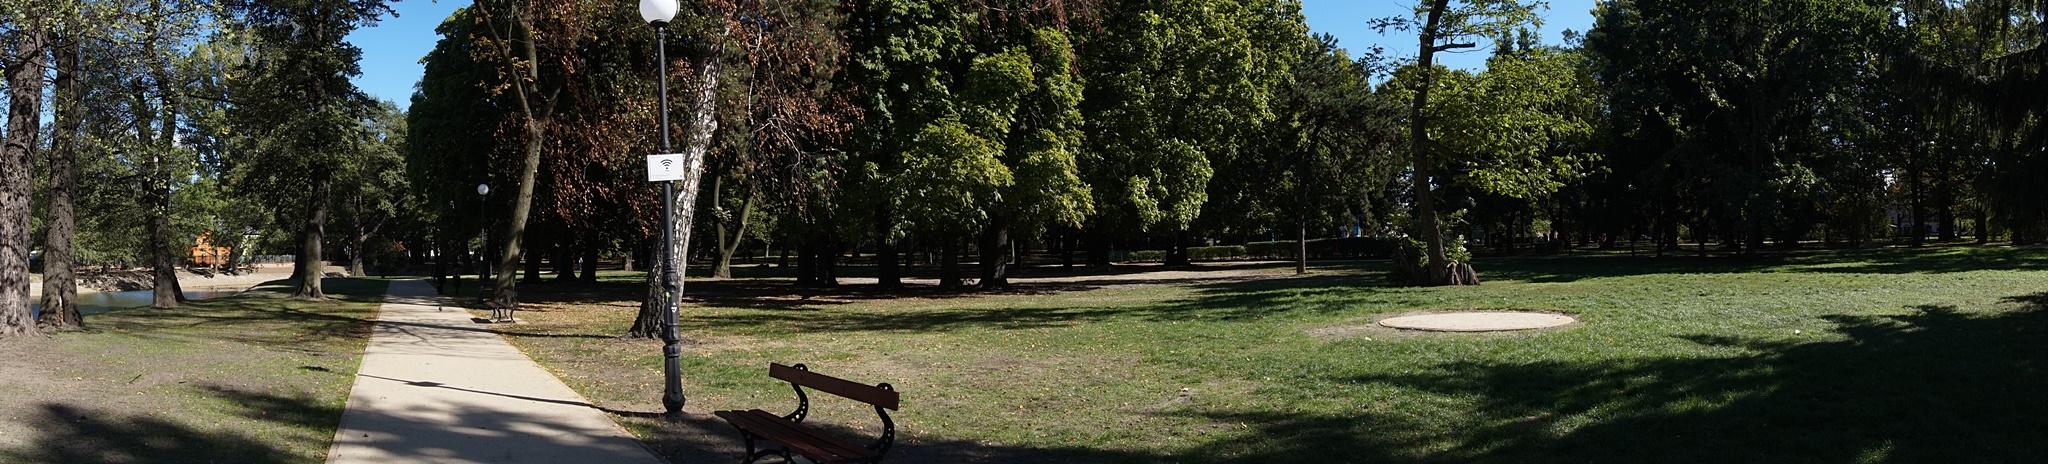 Park im Reymonta